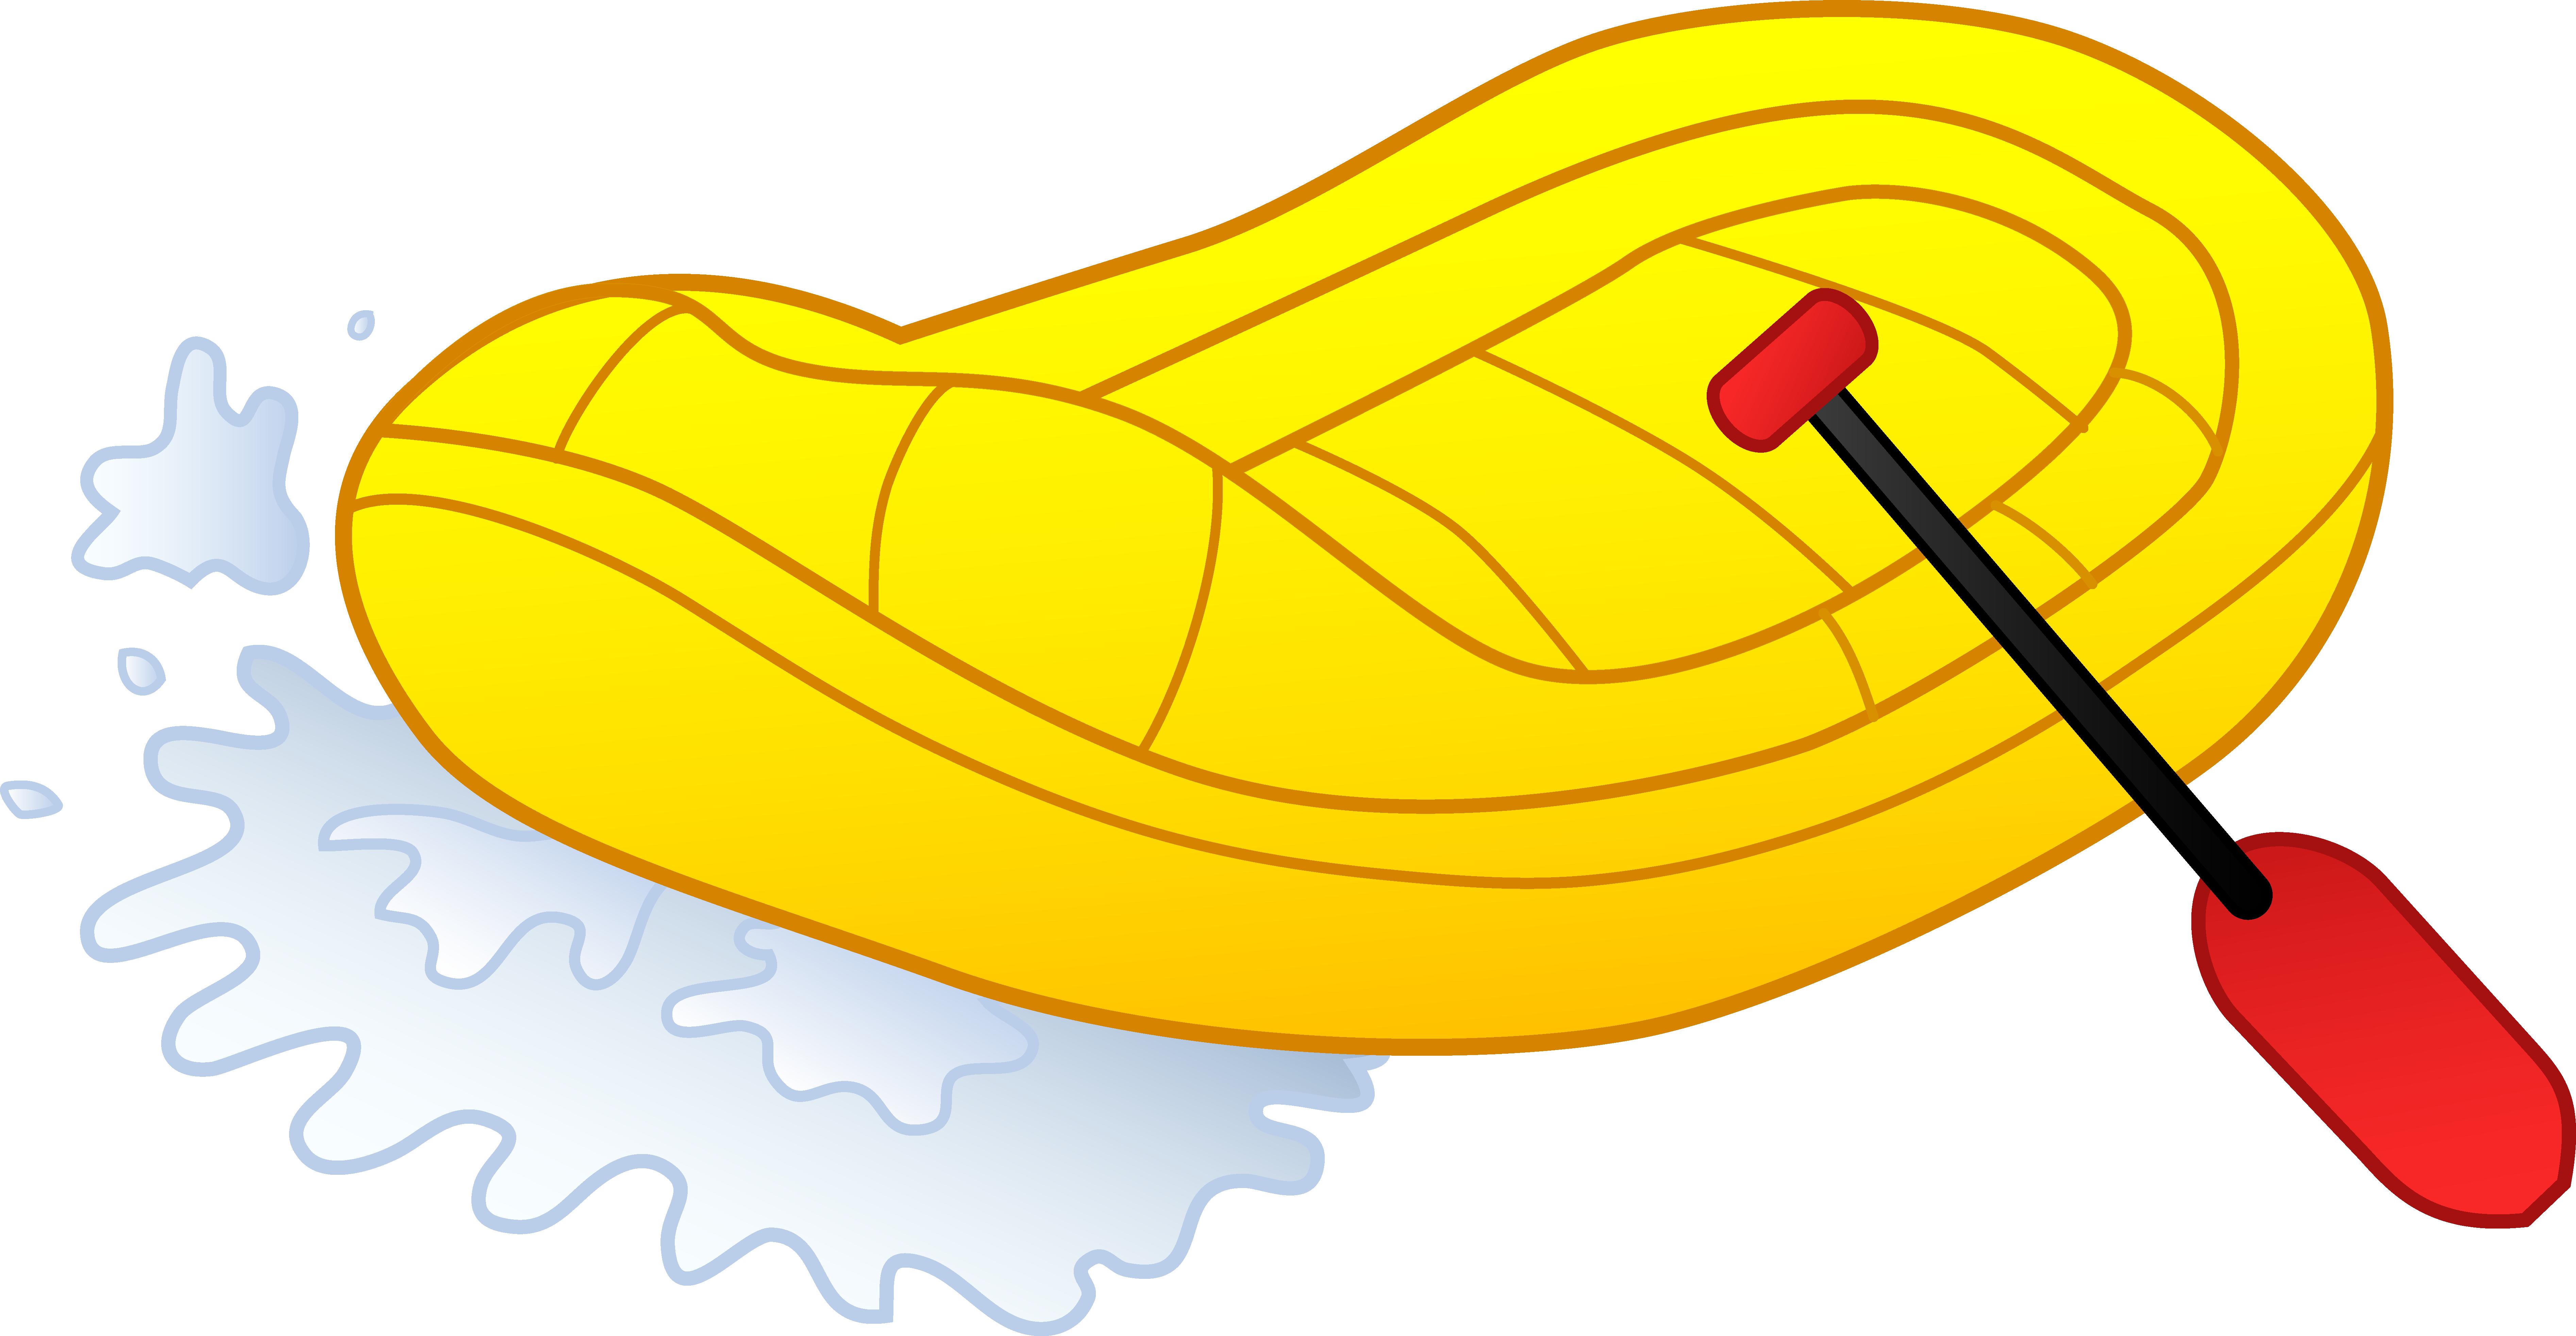 Clipart boat car. River rafting illustration free